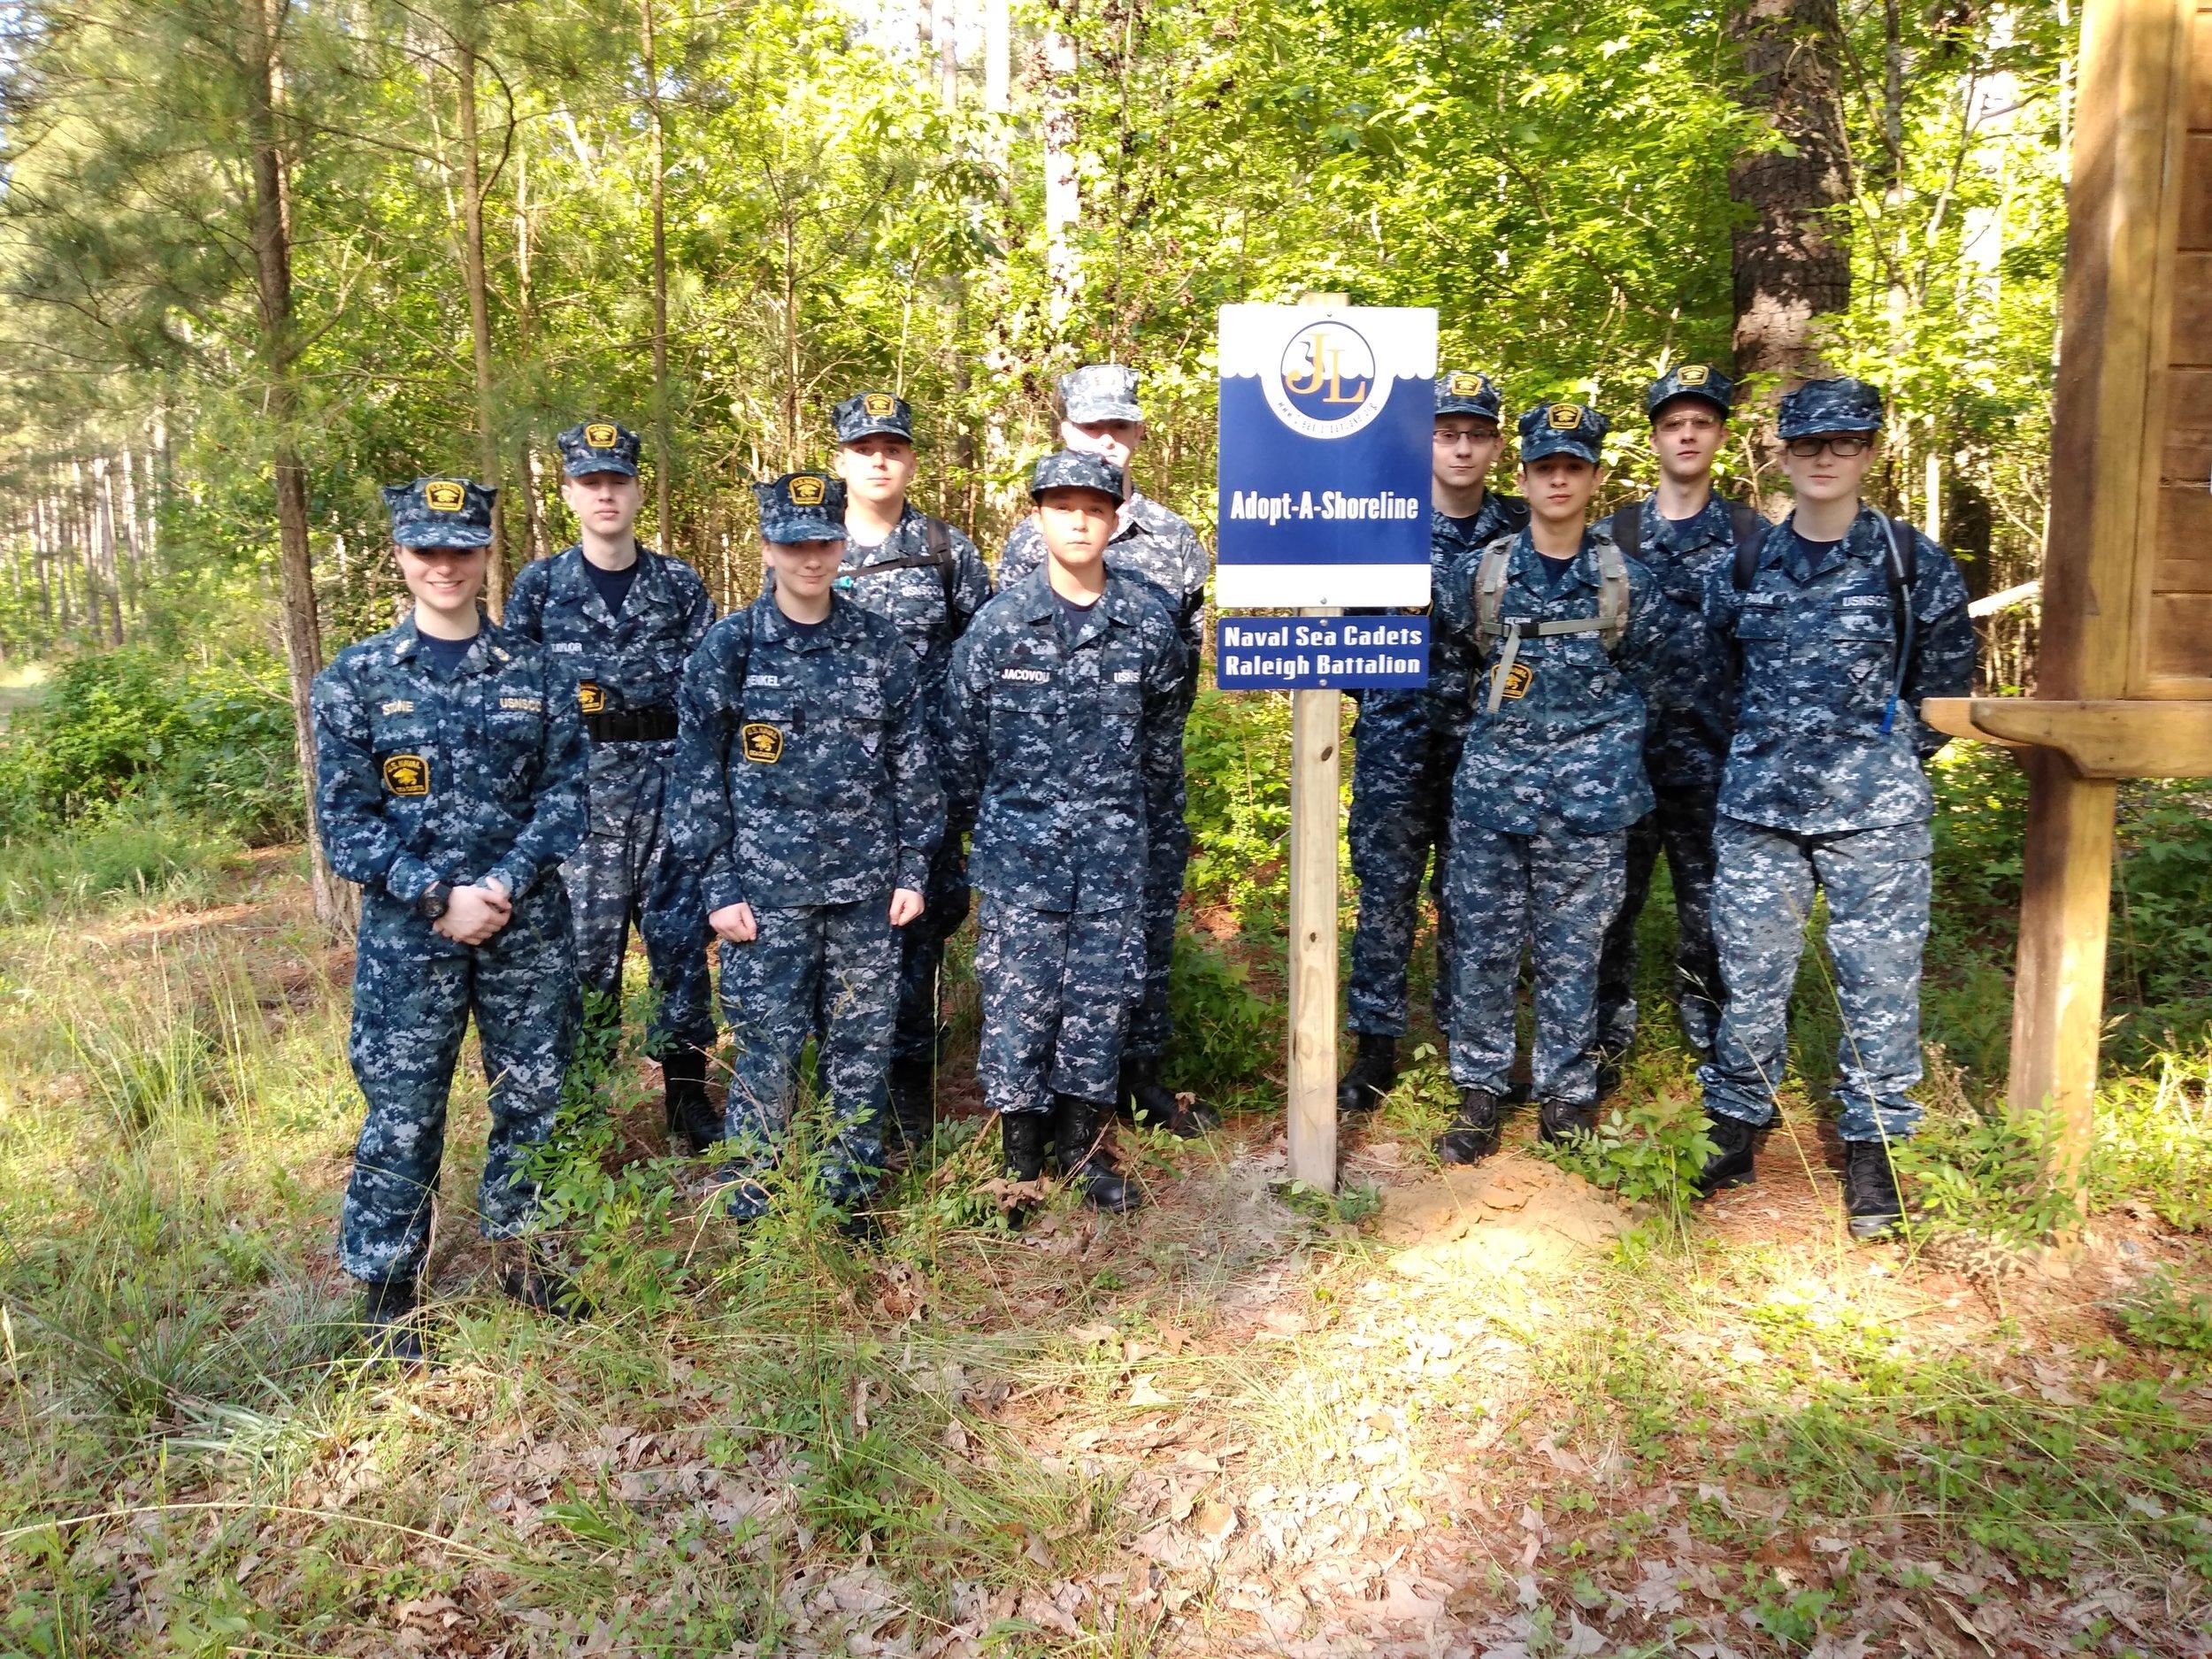 naval sea cadets.jpg